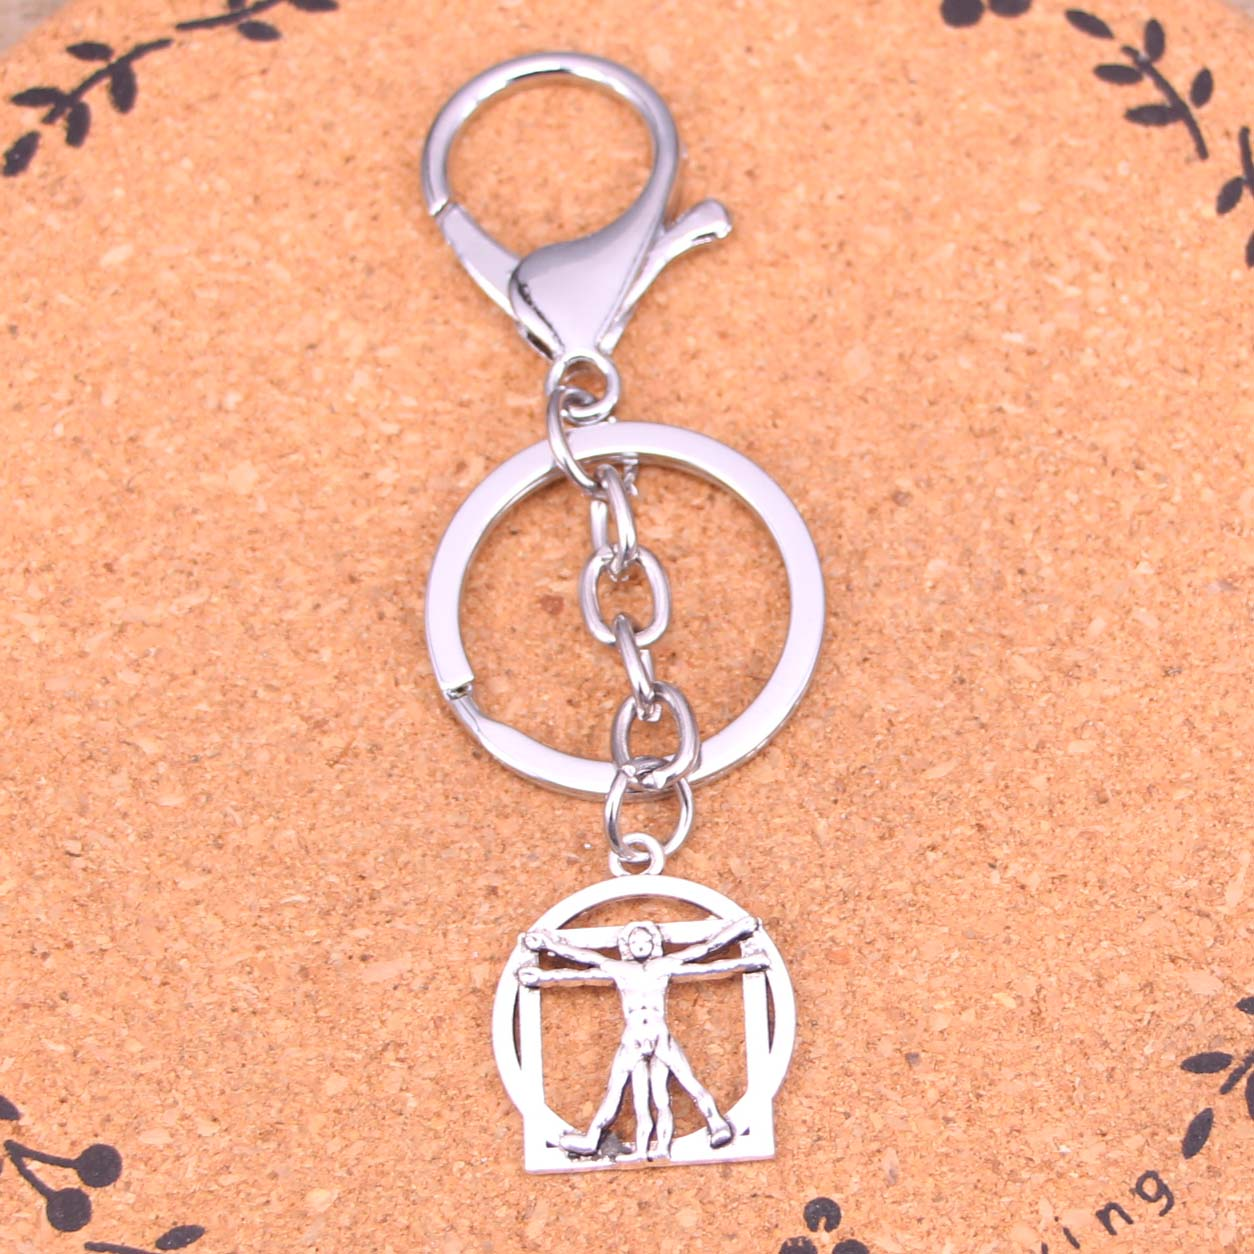 New Fashion Silver Color Alloy Metal Pendant Da Vinci Human Figure Key Chain Key Ring Gift For Car Keychain Accessory